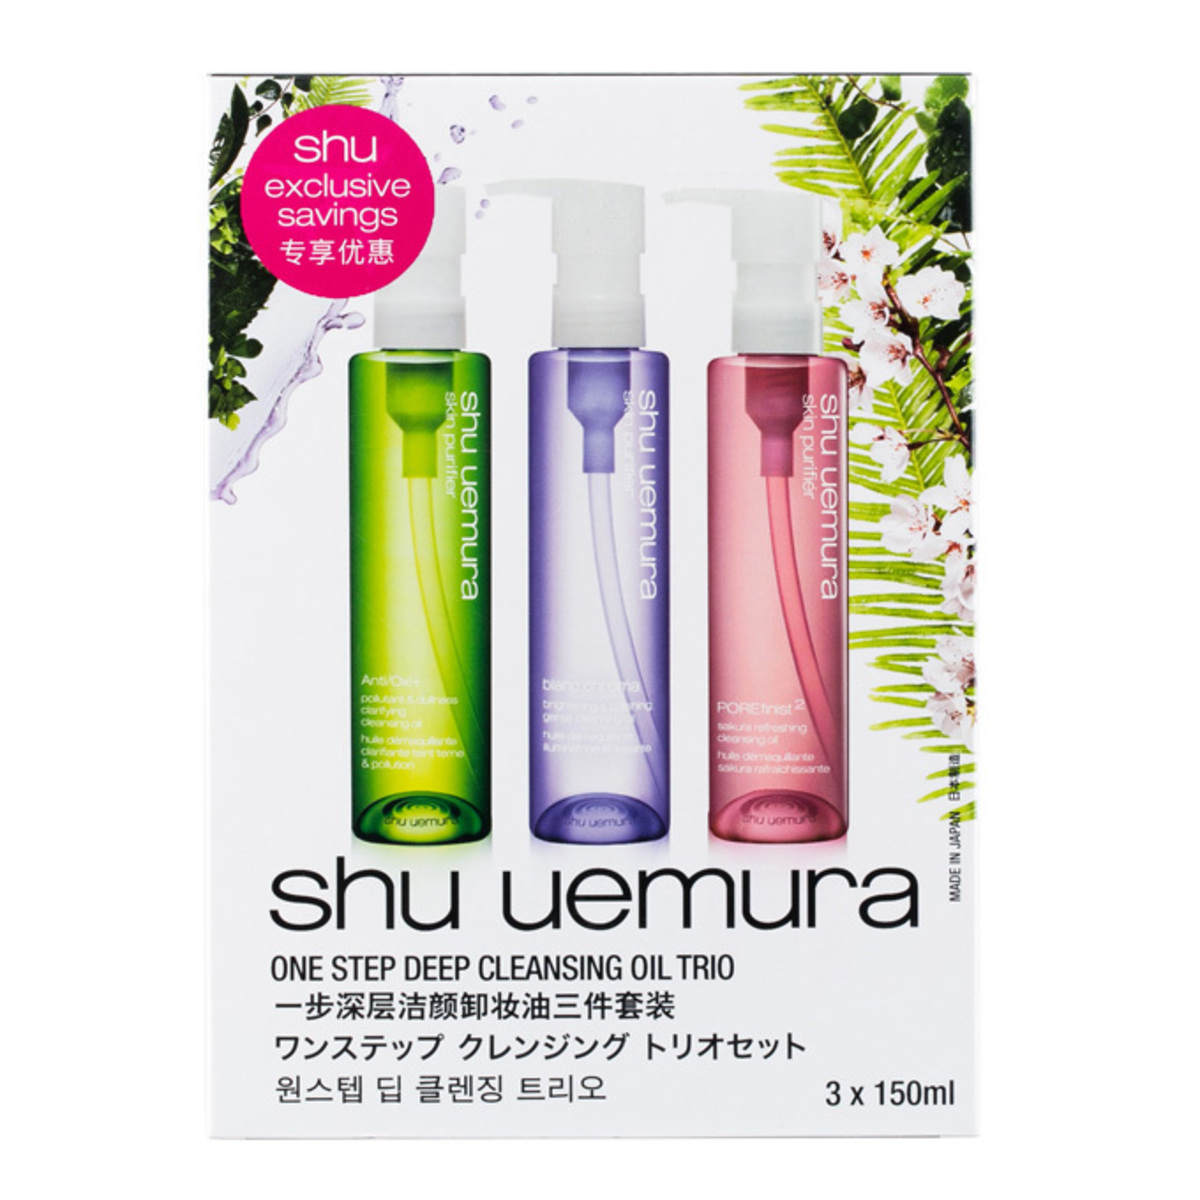 Shu Trio Oil 150ml*3 (4894374038198) (Parallel Import goods)